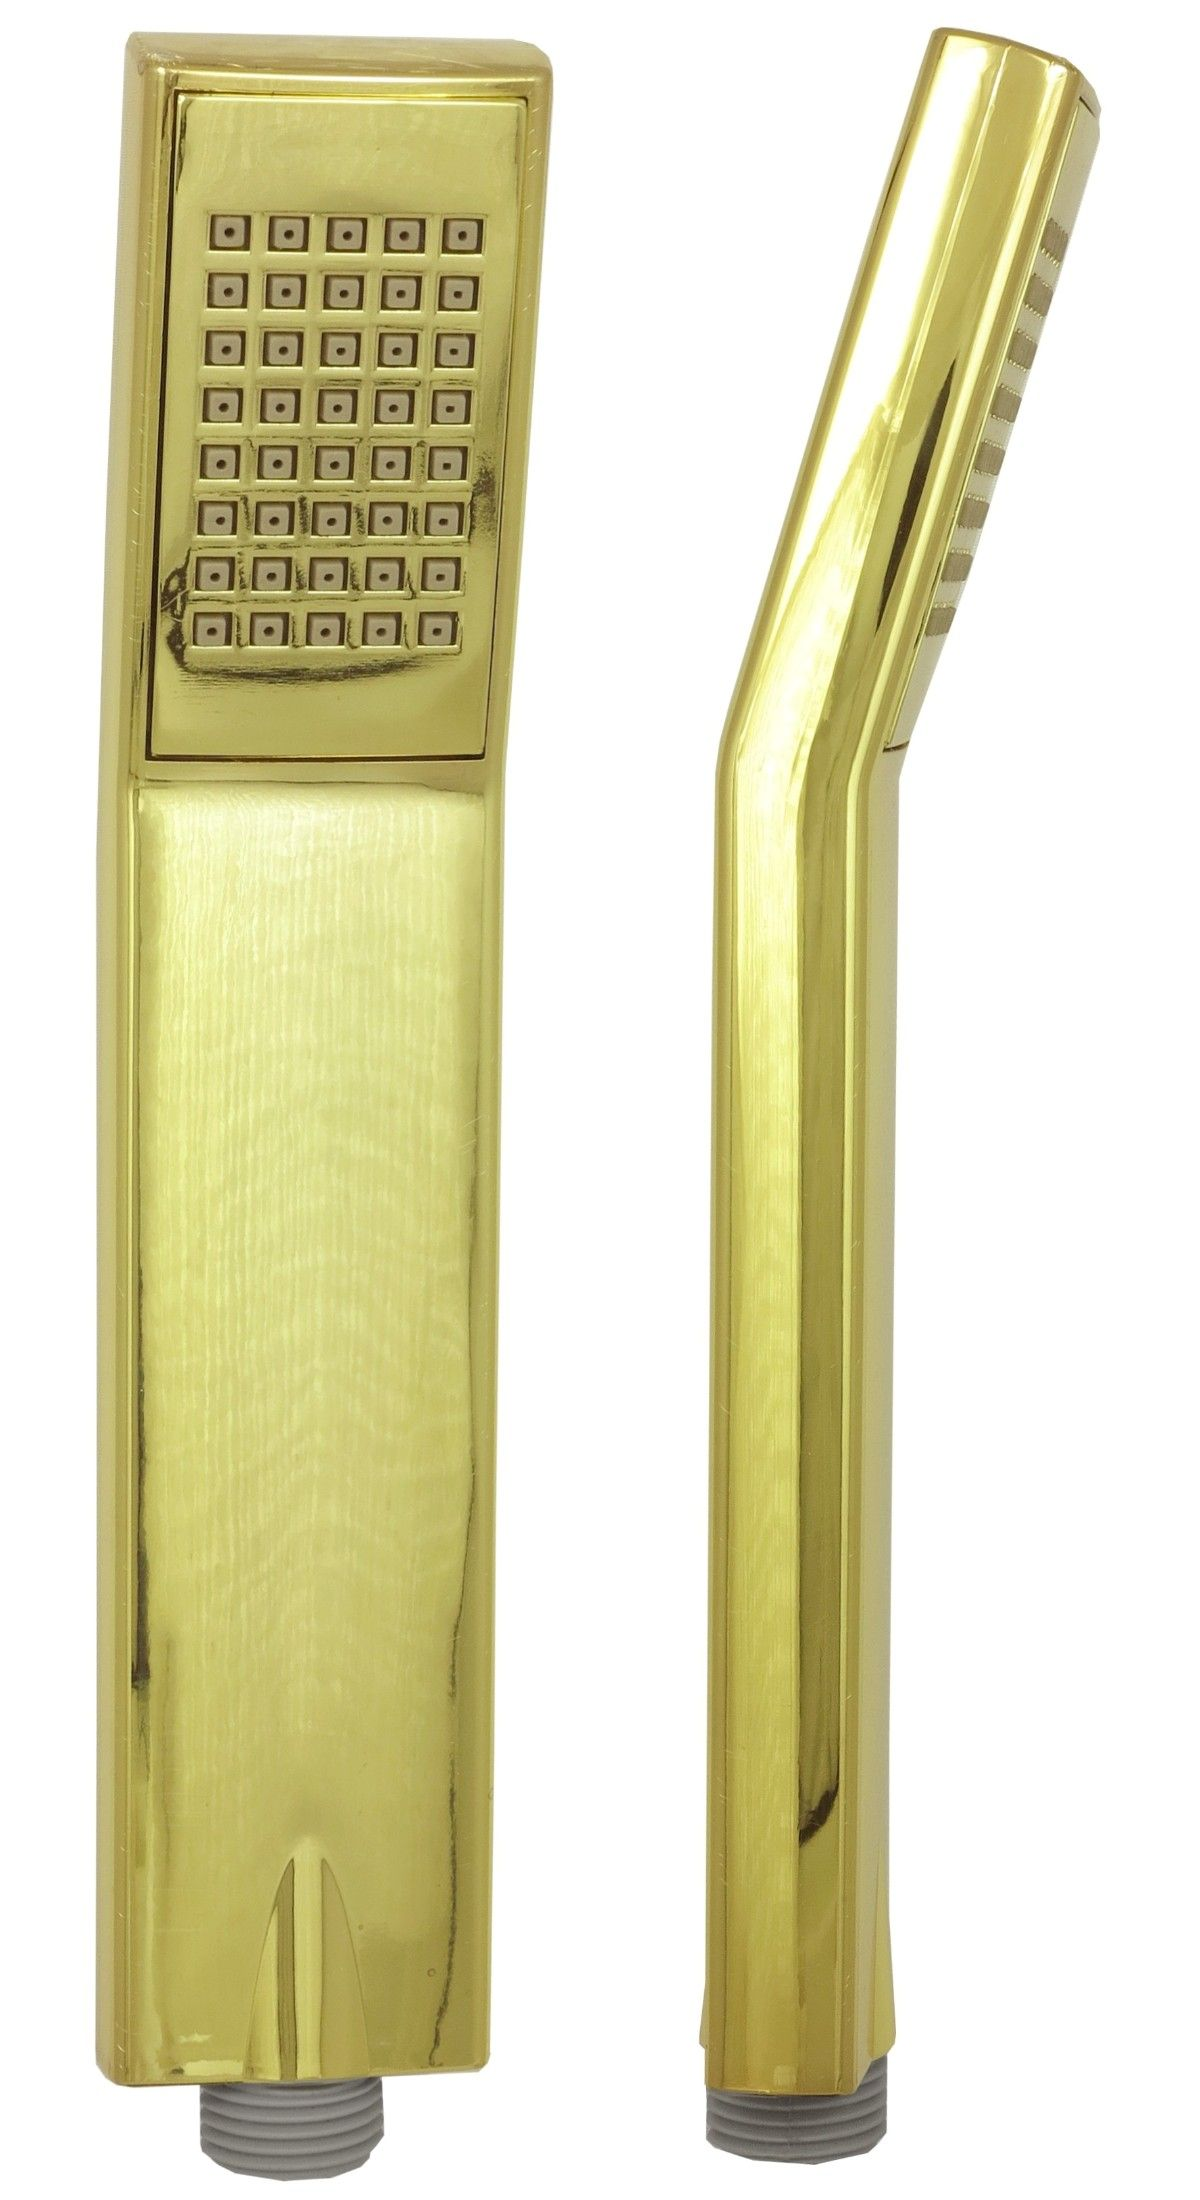 Armatur Gold 20 Karat Handbrause Duschkopf Brausekopf Stabbrause